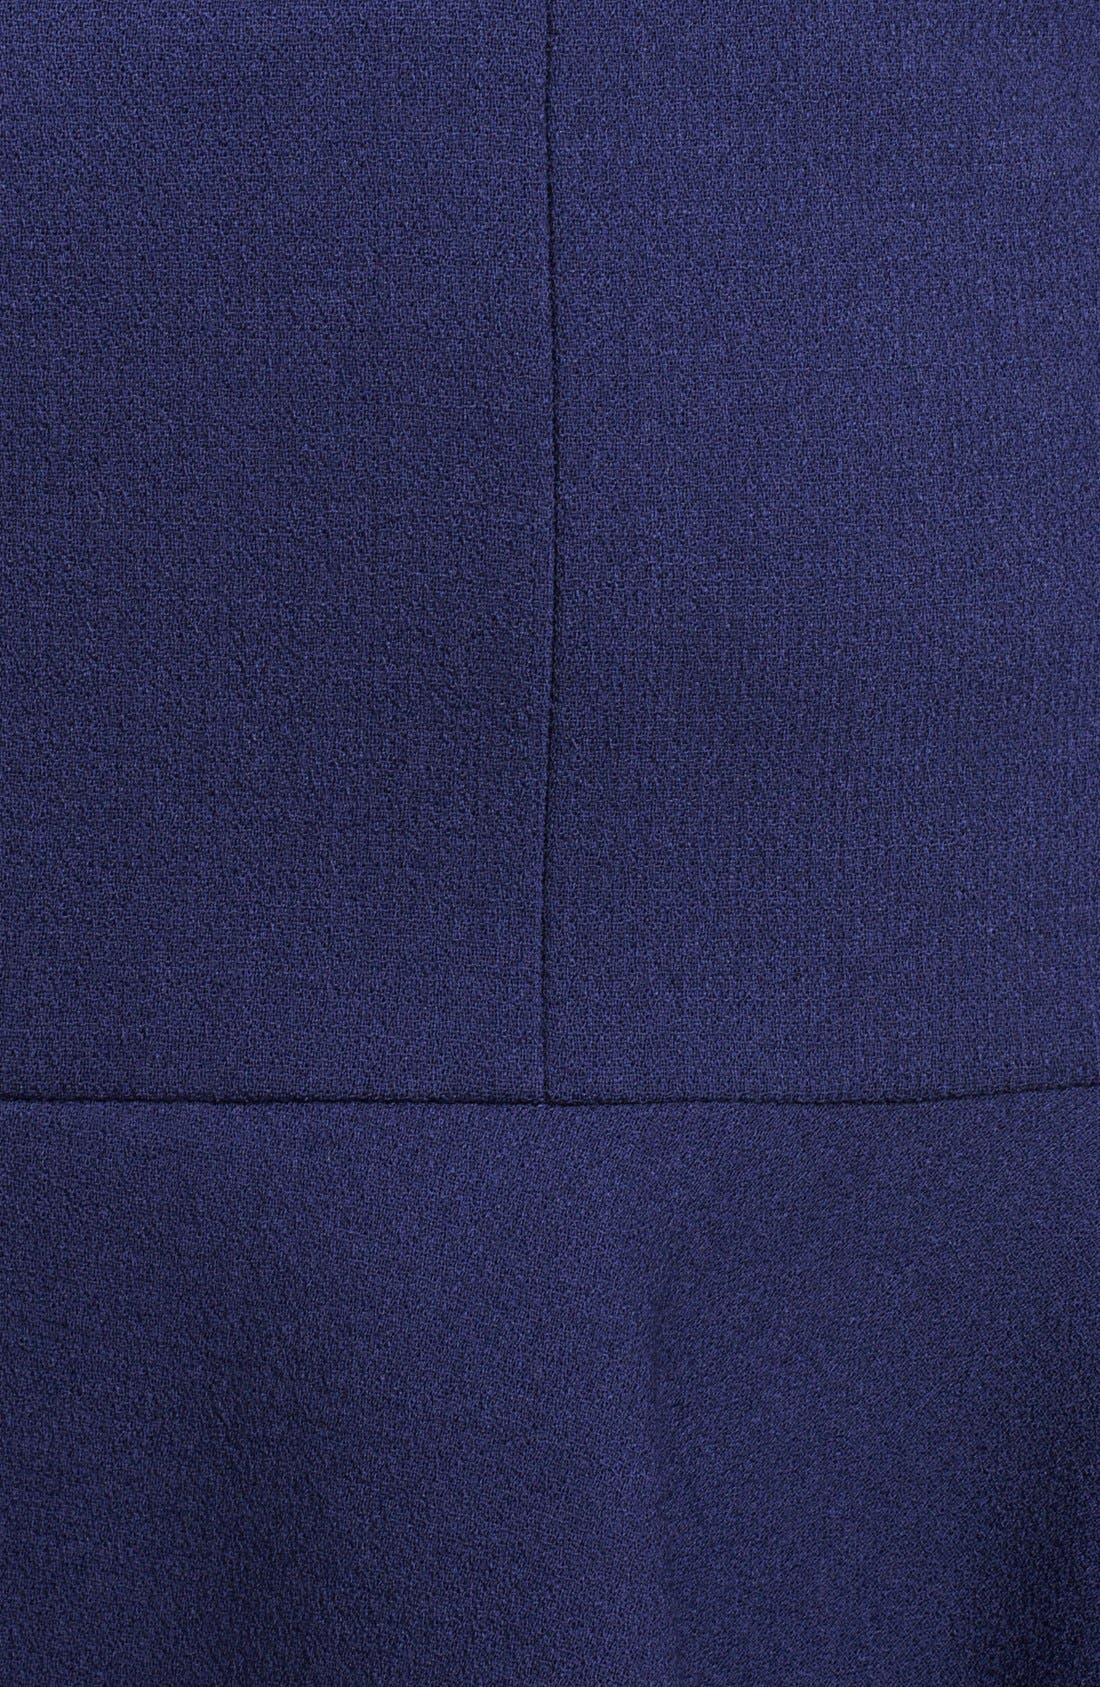 Alternate Image 3  - Michael Kors Bouclé Stretch Wool Skirt